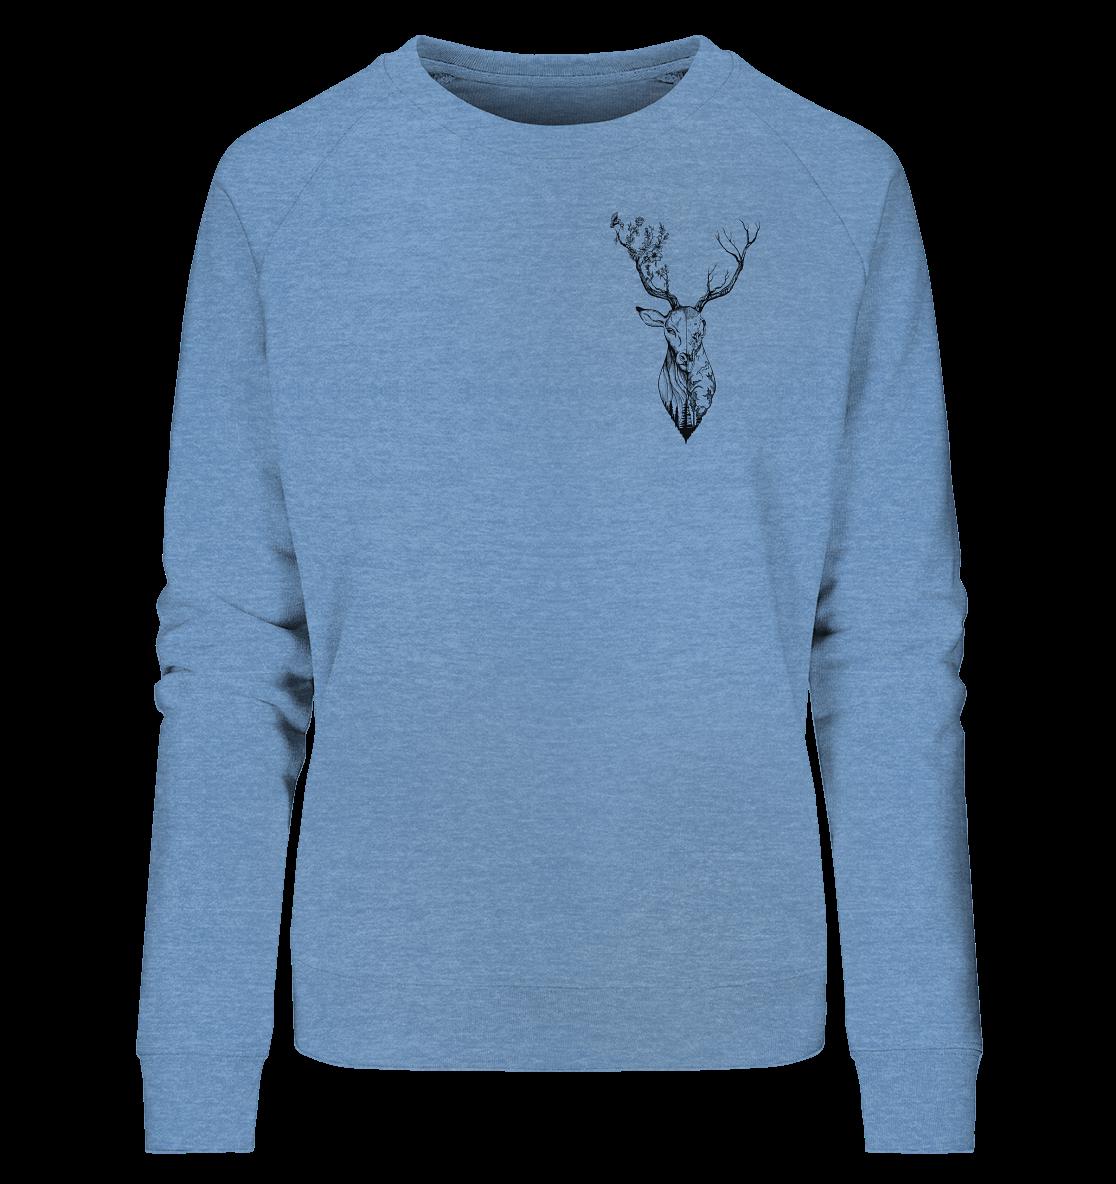 front-ladies-organic-sweatshirt-6090c4-1116x-7.png